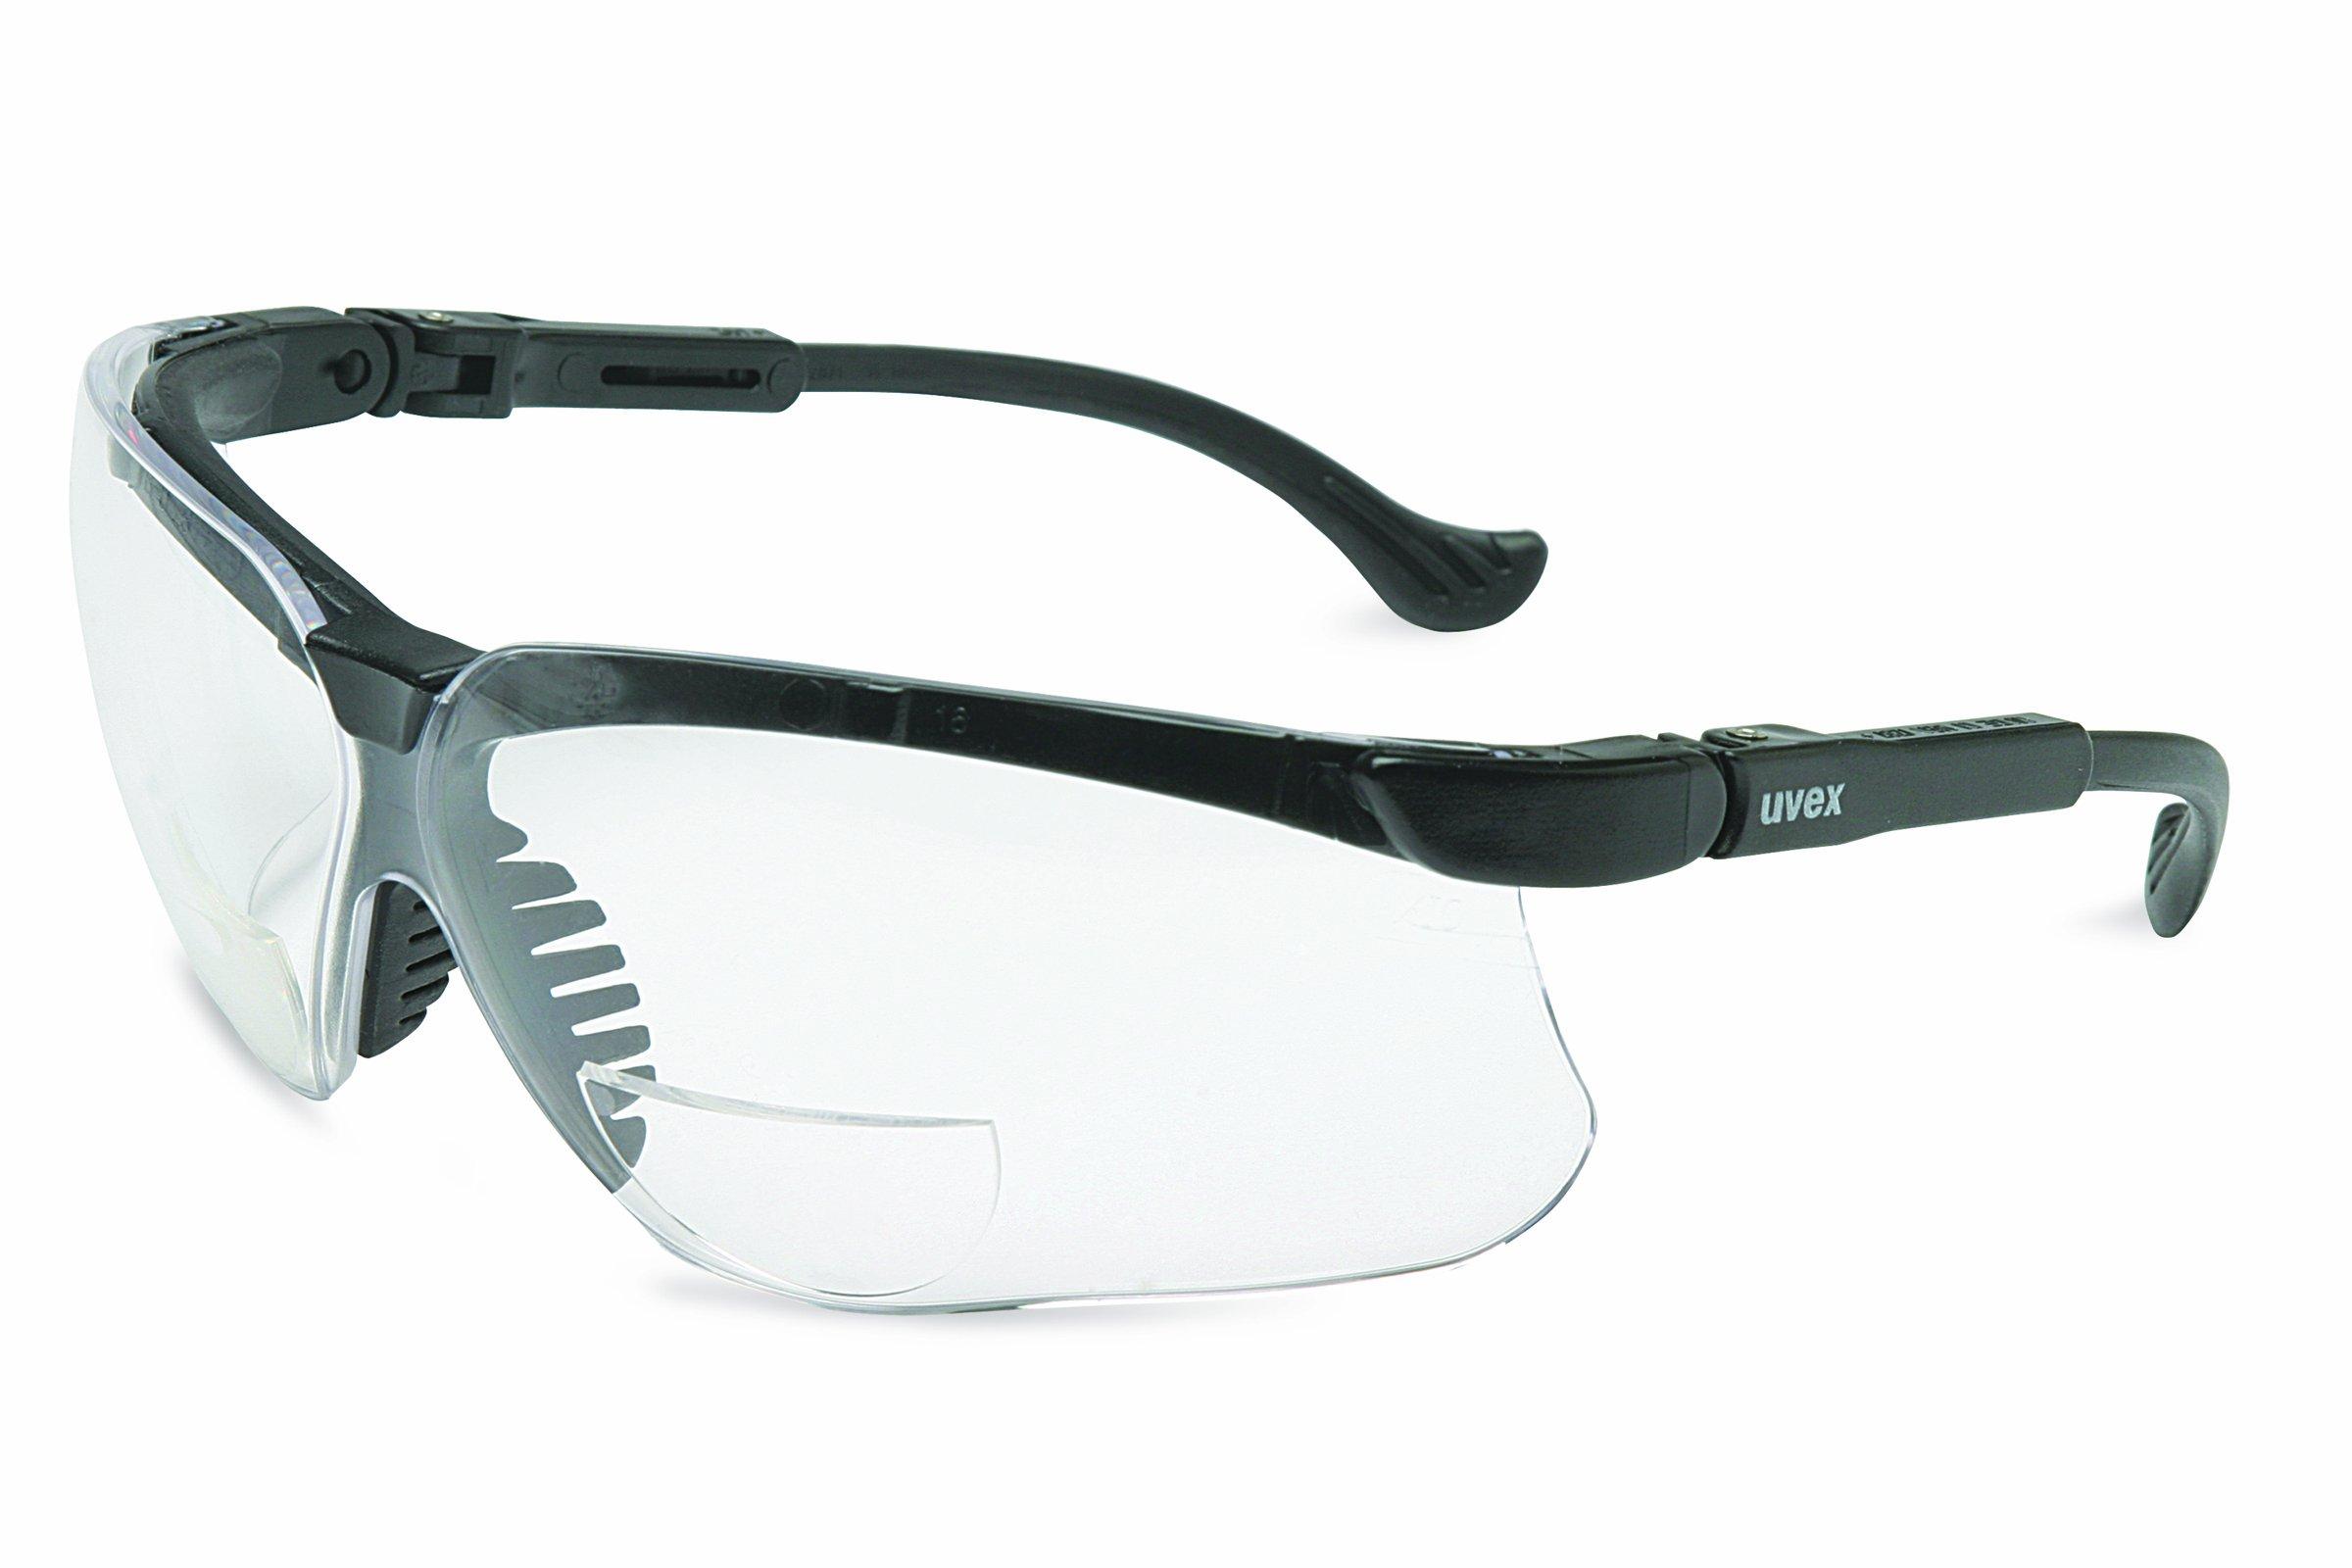 Uvex S3762 Genesis Reading Magnifiers Safety Eyewear +2.0, Black Frame, Clear Ultra-Dura Hardcoat Lens